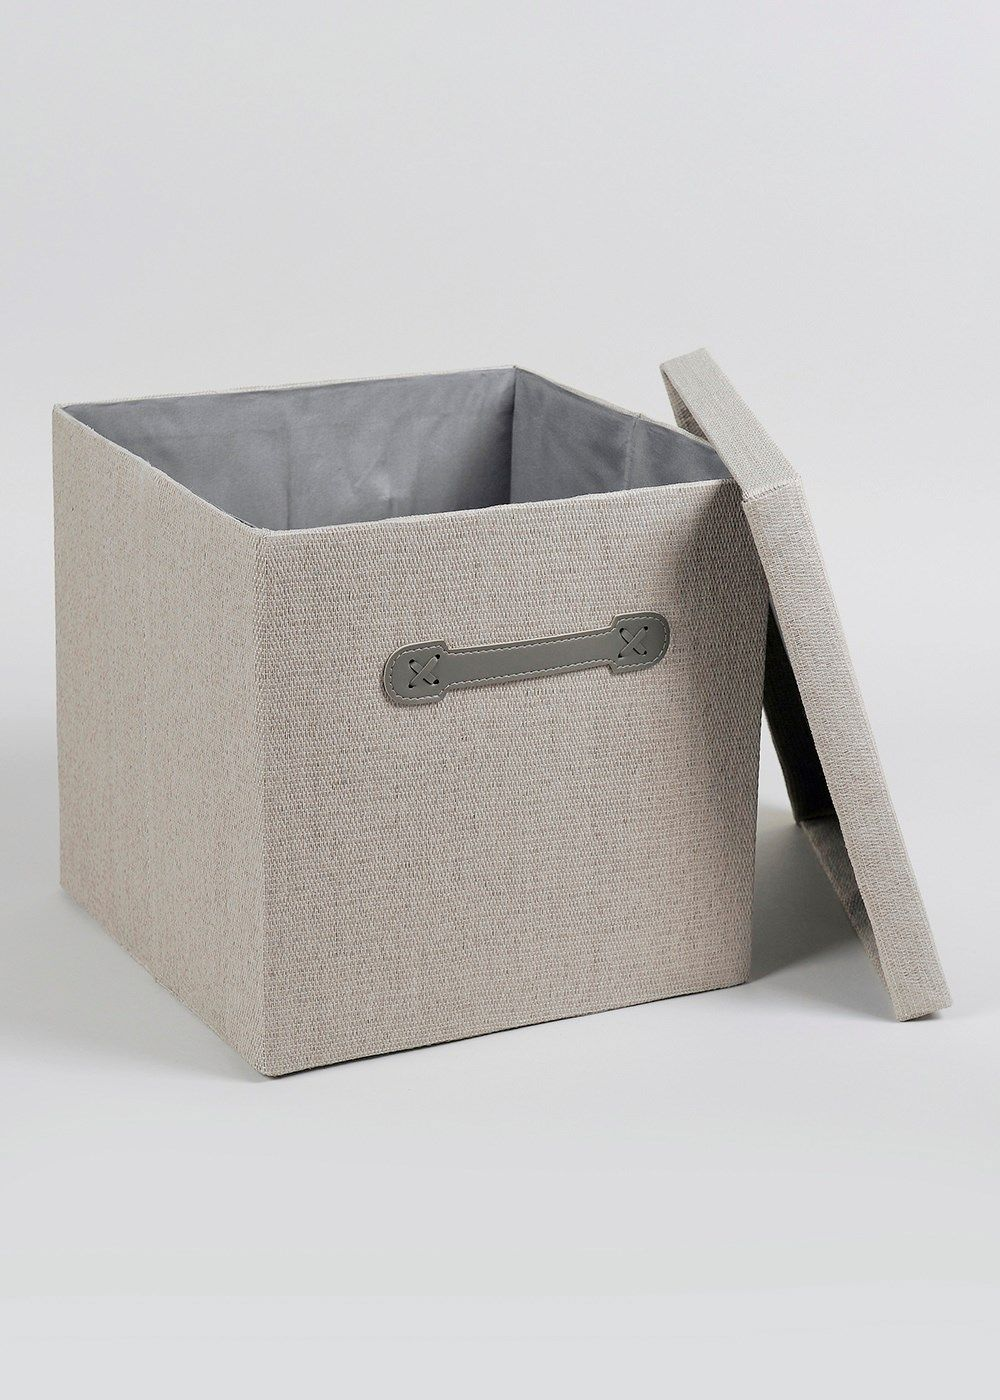 Decorative Fabric Storage Boxes Foldable Fabric Storage Box 33Cm X 33Cm X 31Cm  Fabric Storage